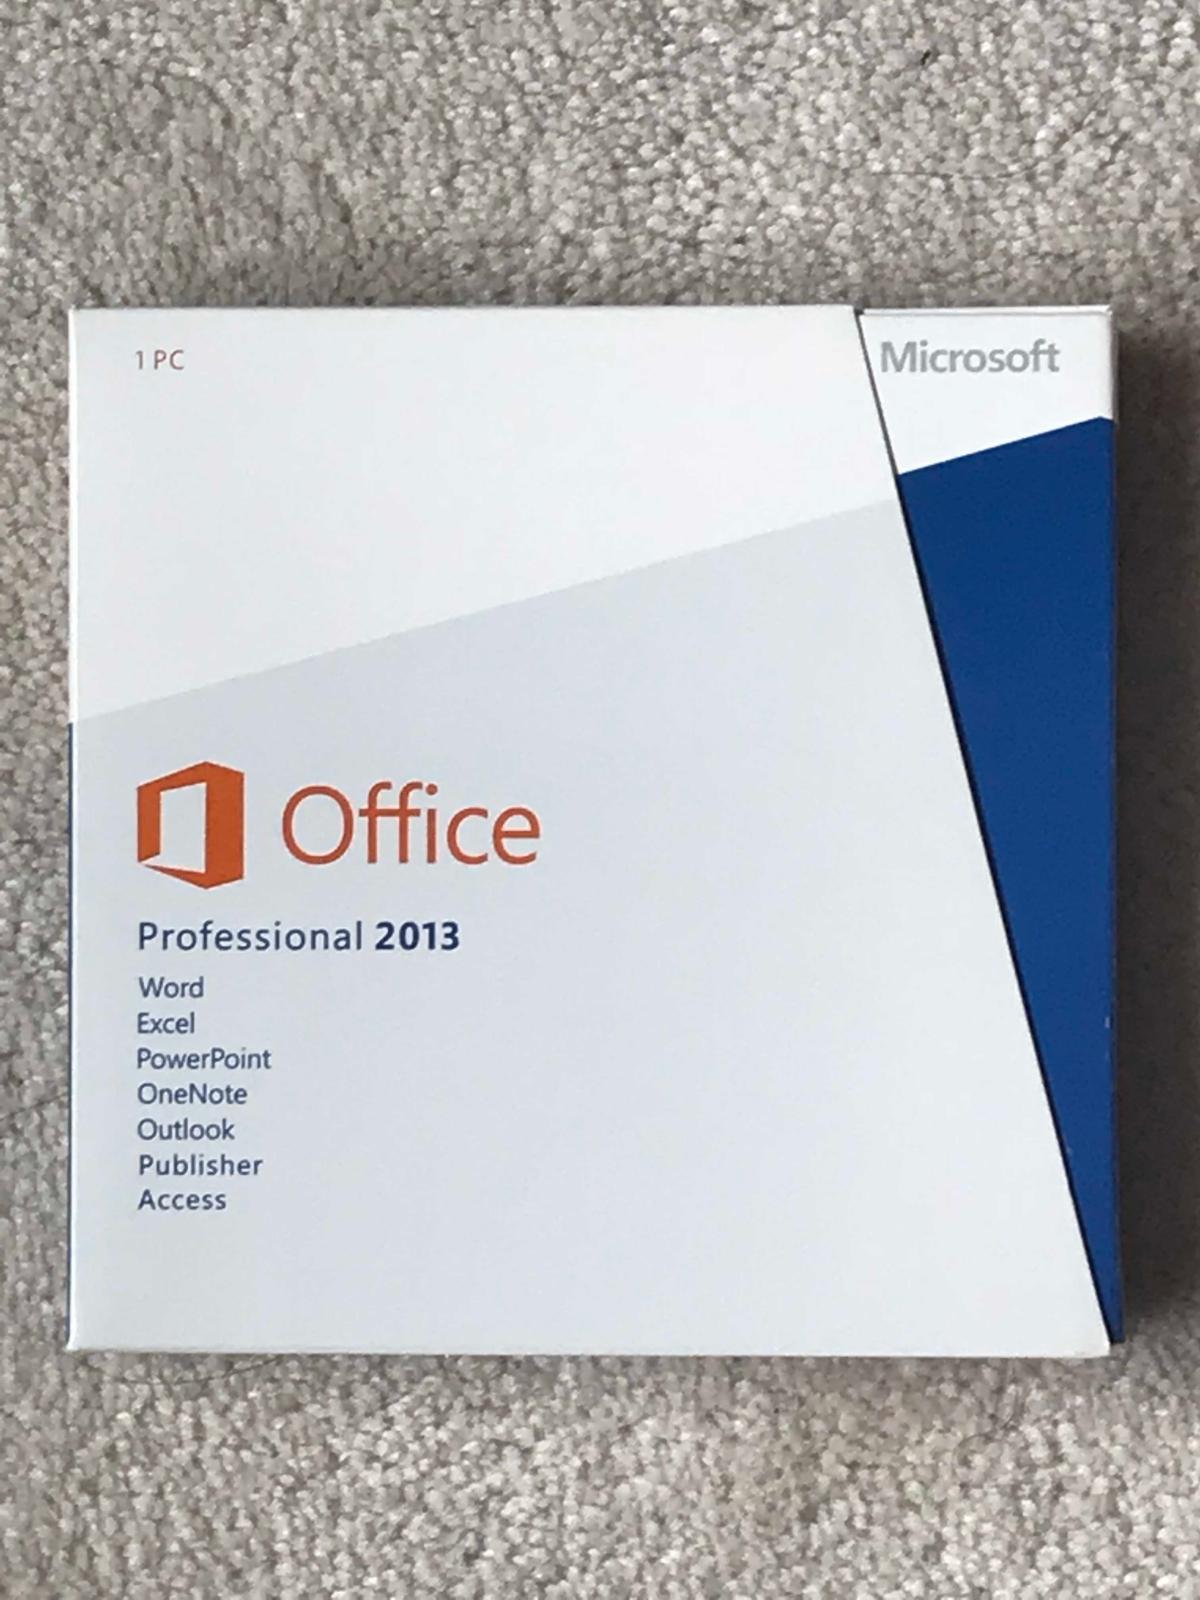 Microsoft Office Professional 2013 Full Version 1 Pc Licence 269 Windows 10 Profesional 2016 Pro Plus Original Lisensi Stock Photo